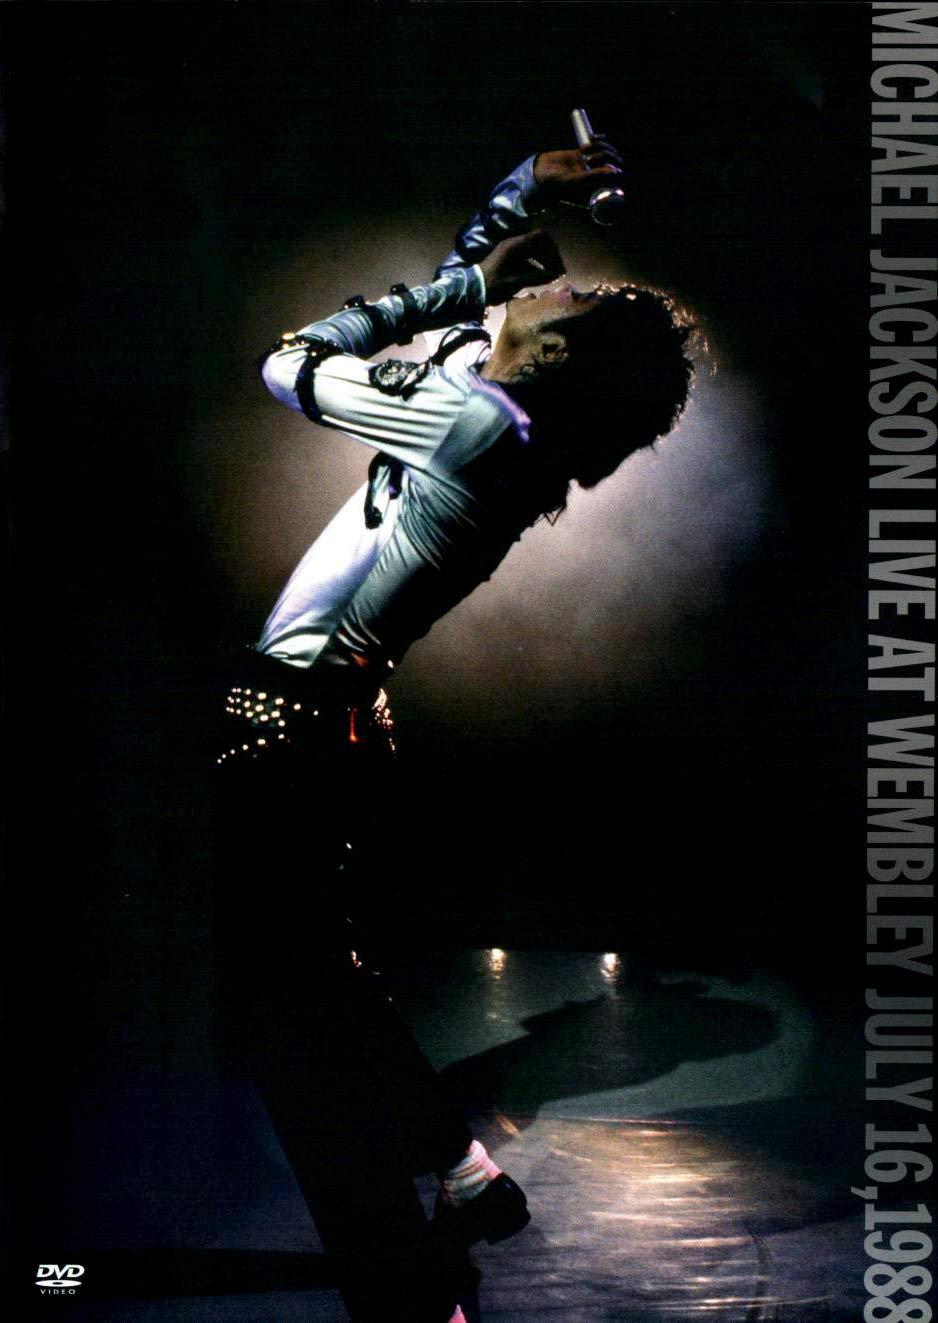 Michael Jackson - DVD Live At Wembley July 16, 1988